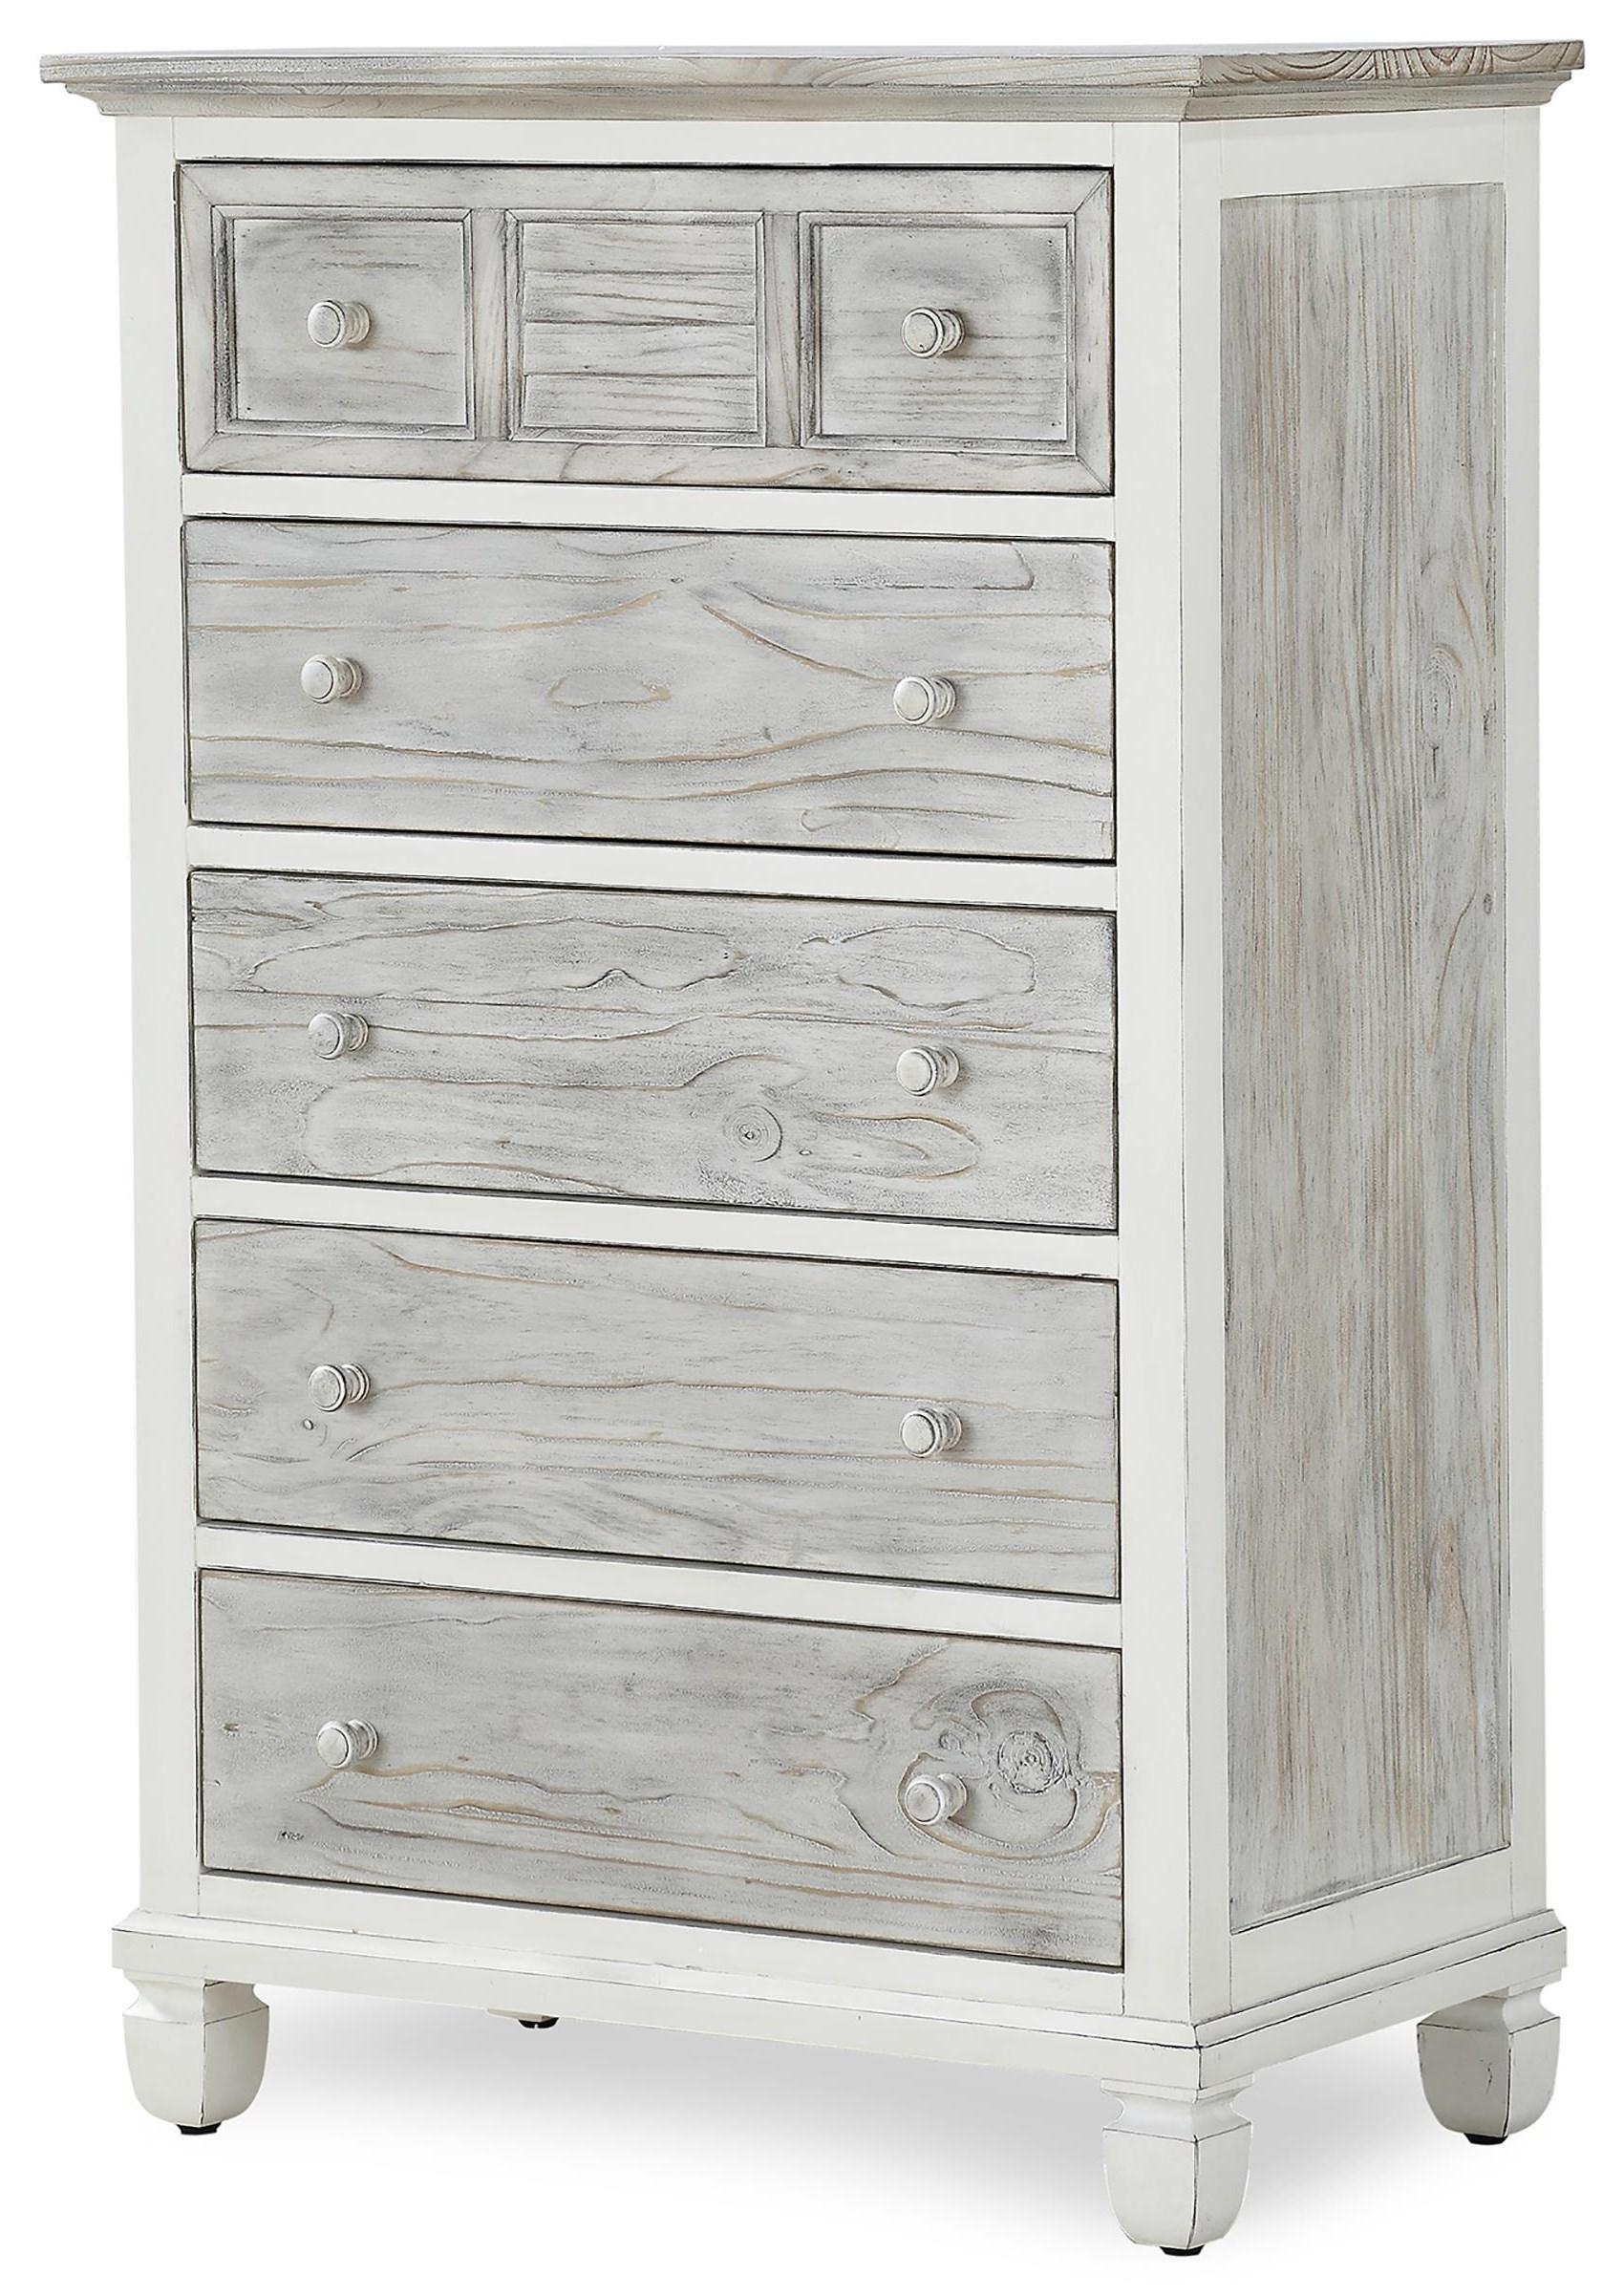 islamorada five drawer chest by Sea Winds Trading Company at Johnny Janosik